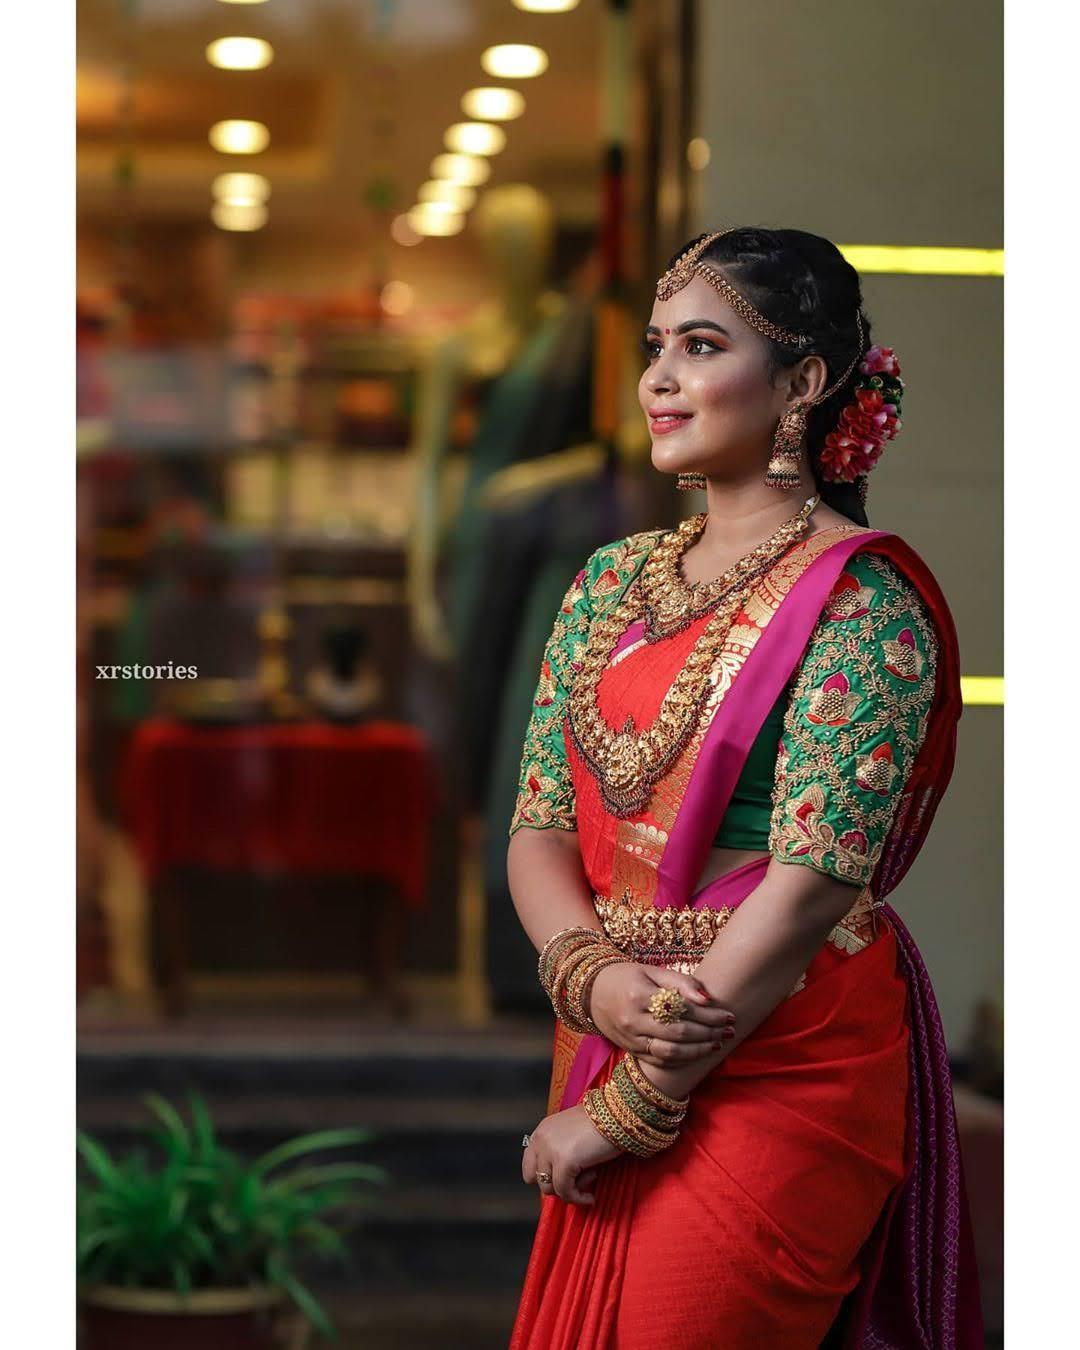 Kanmani-Sweety-Manoharan-Bharathi-Kannamma-26